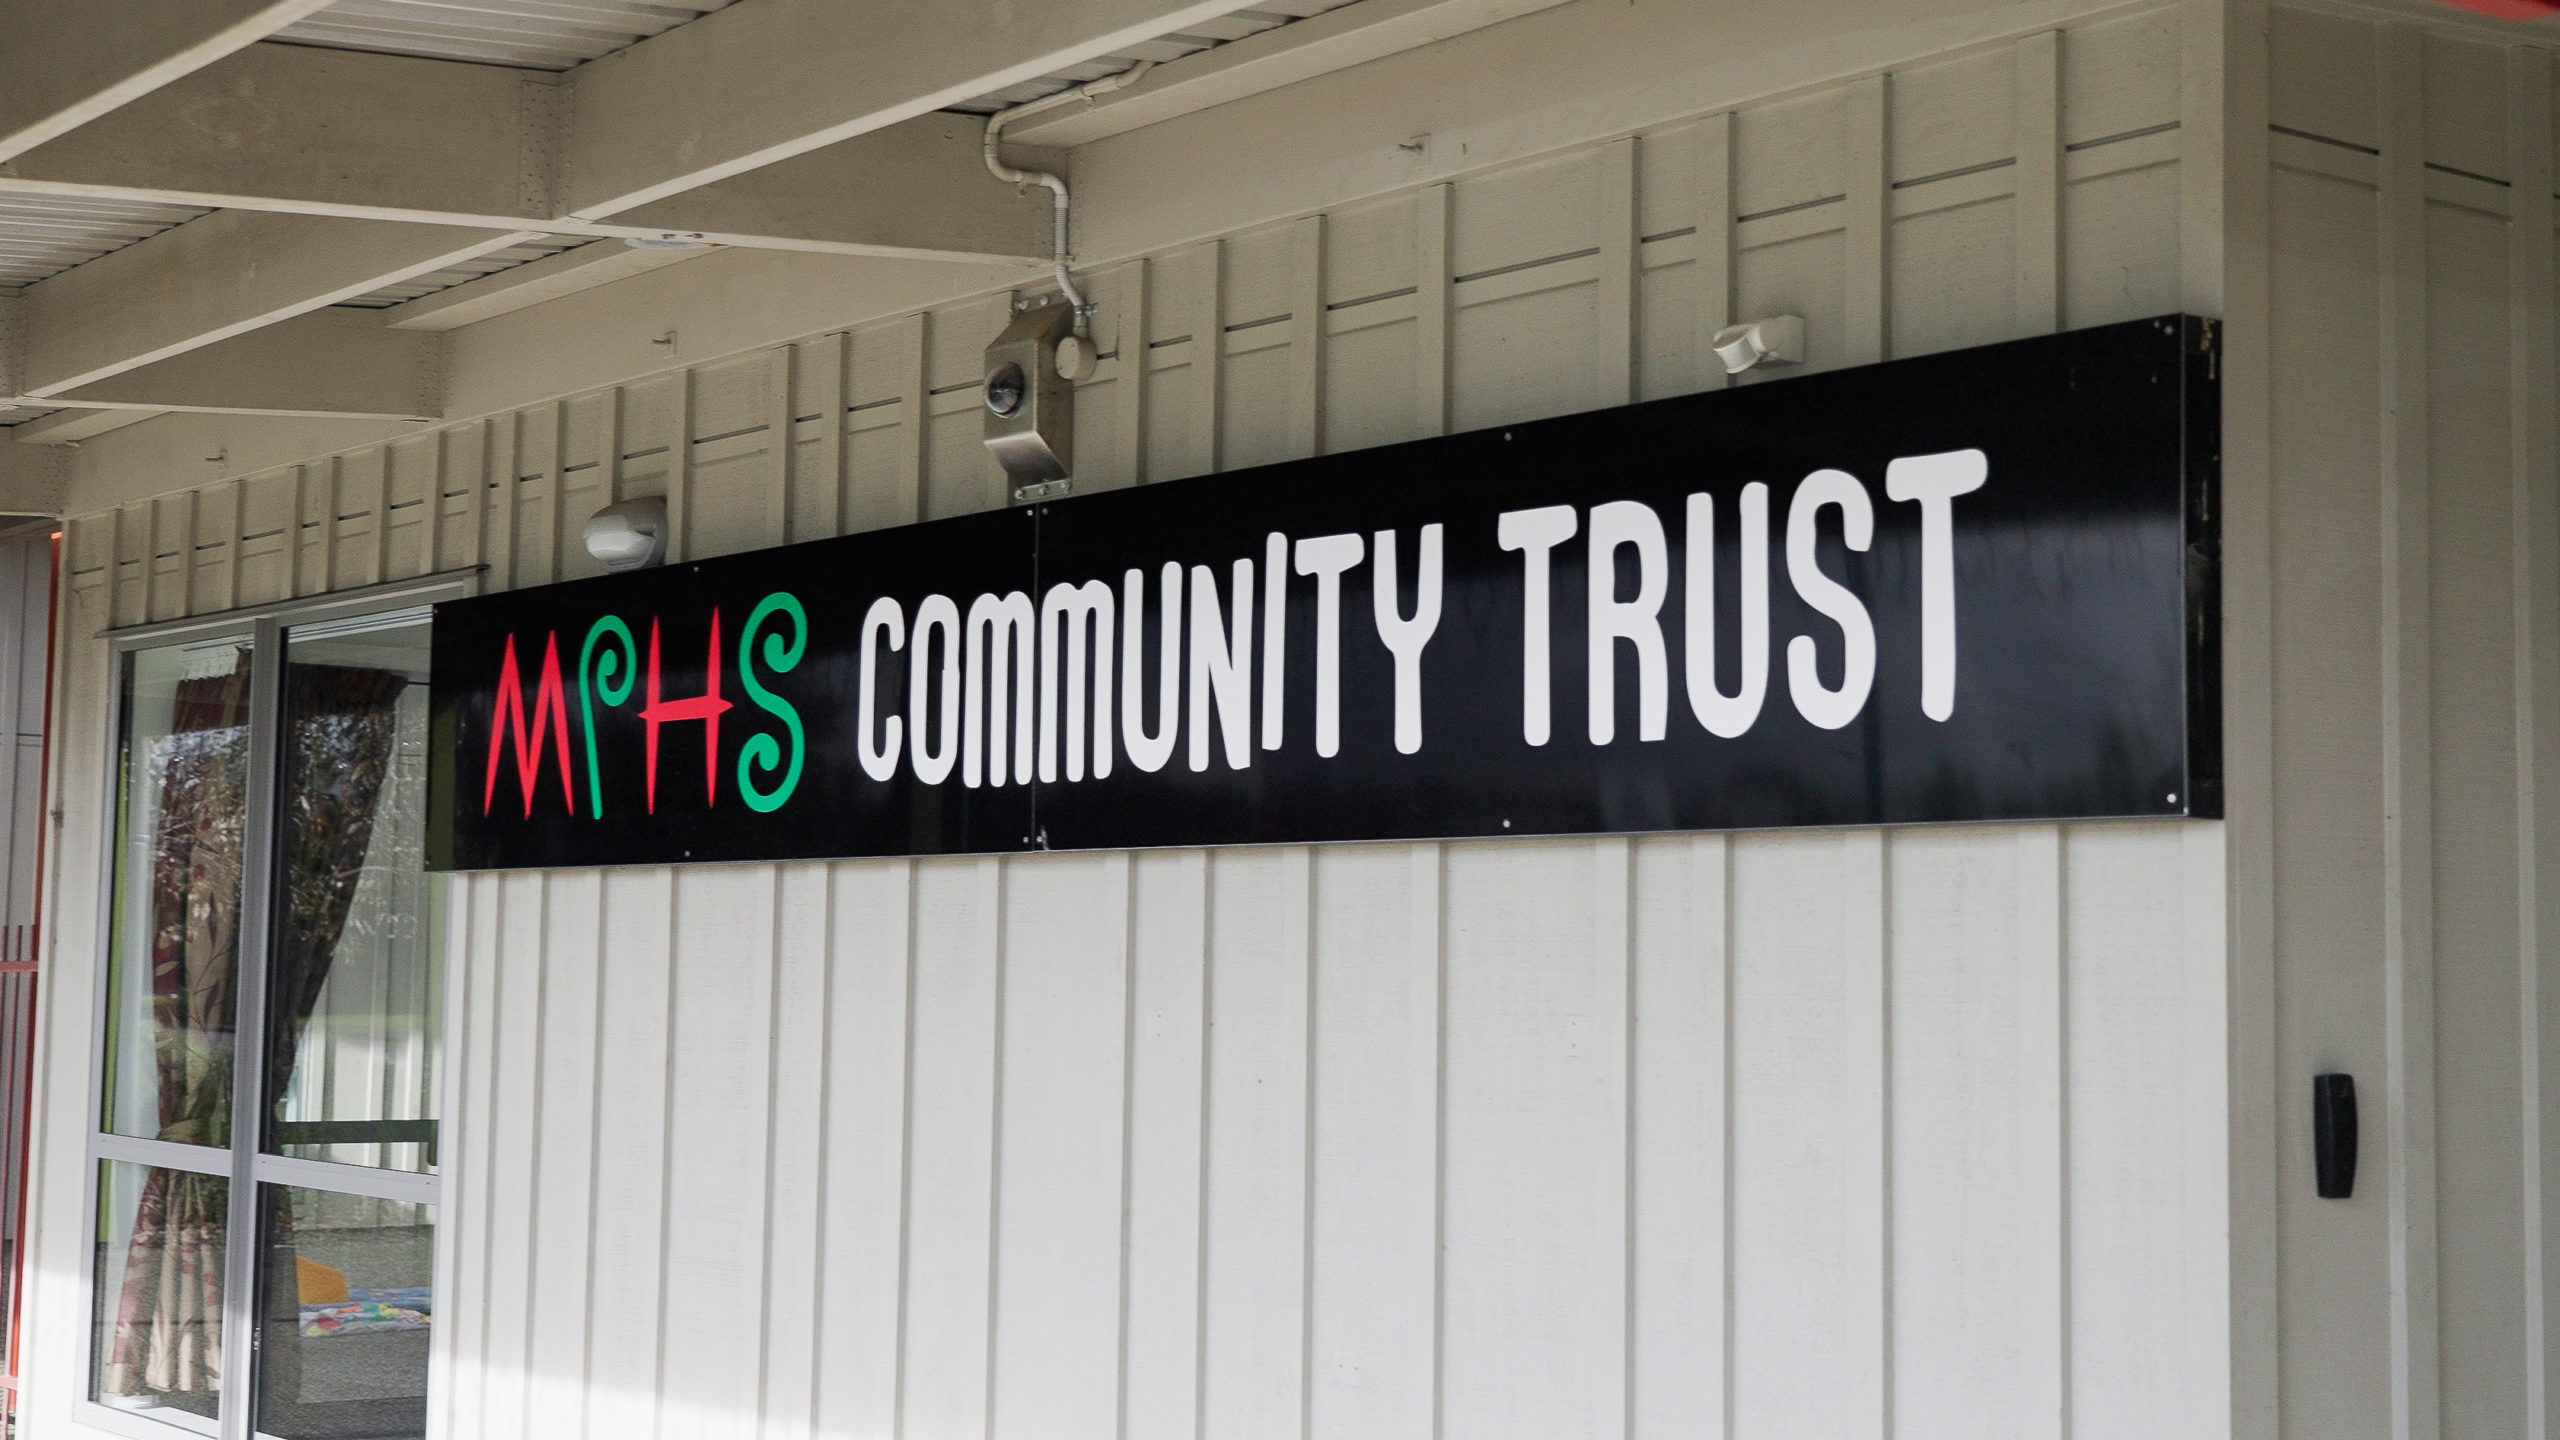 MPHS community trust community involvement by Thomas Consulants Ltd